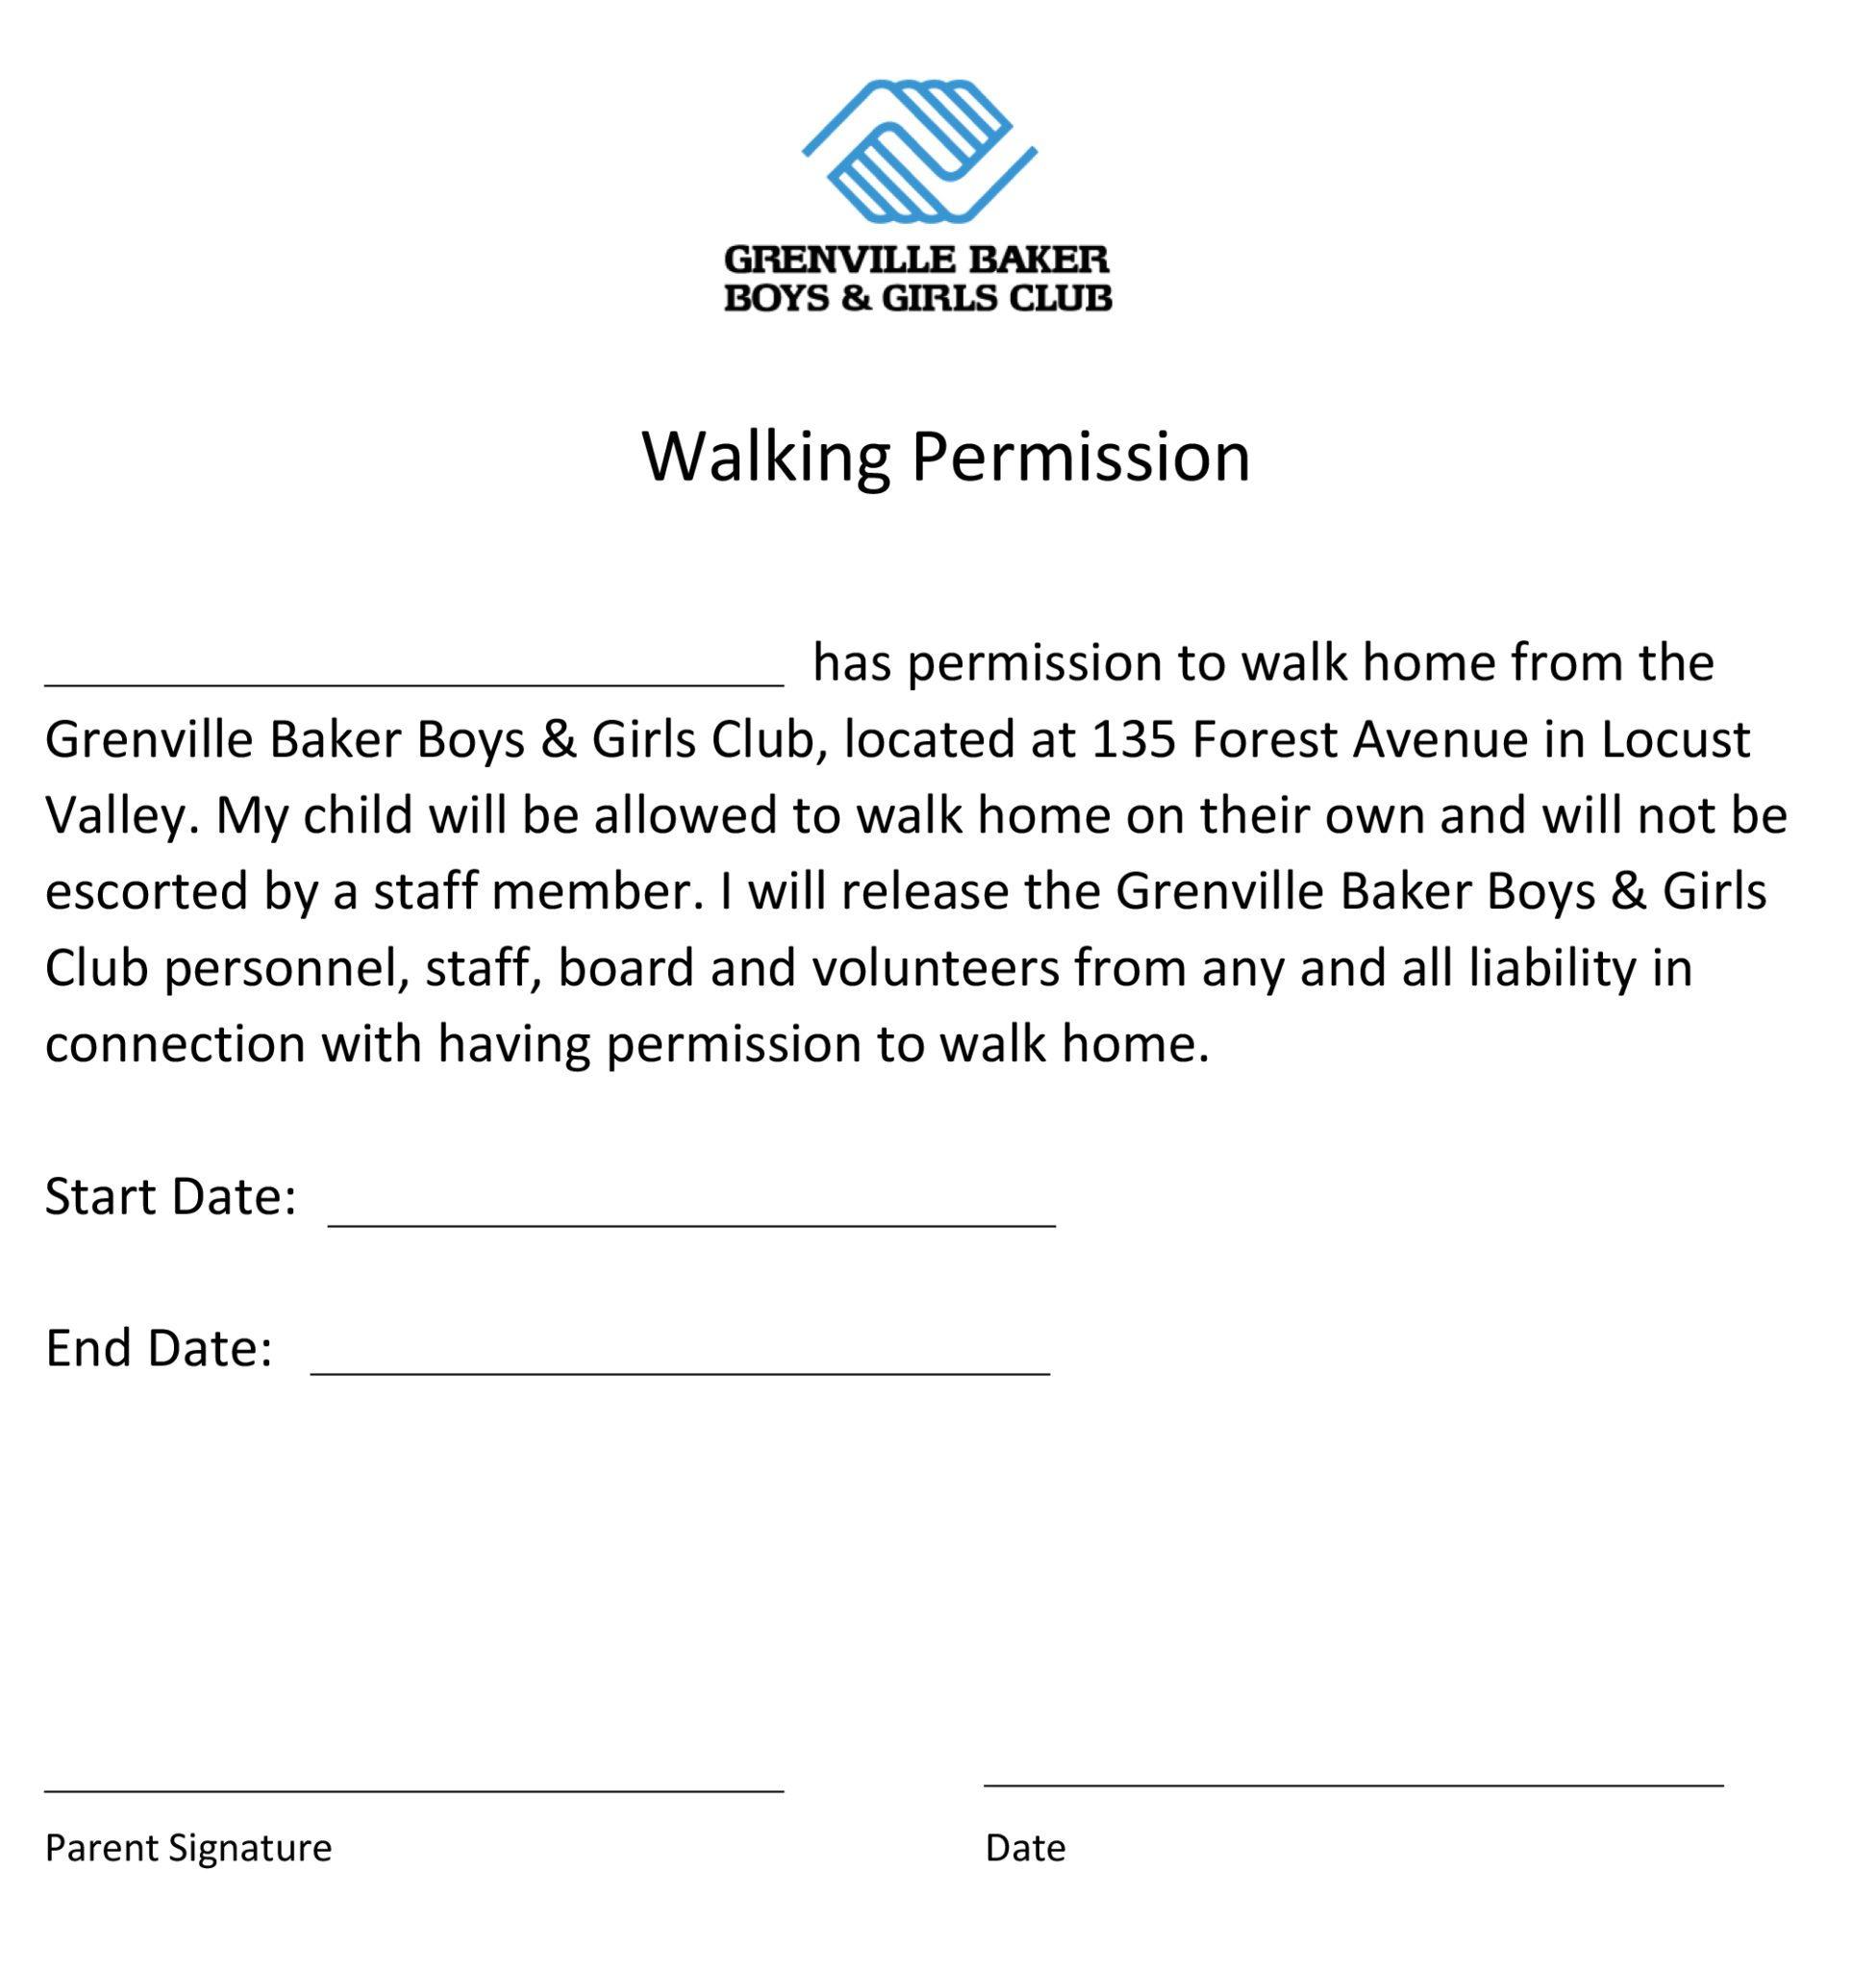 Walking permission